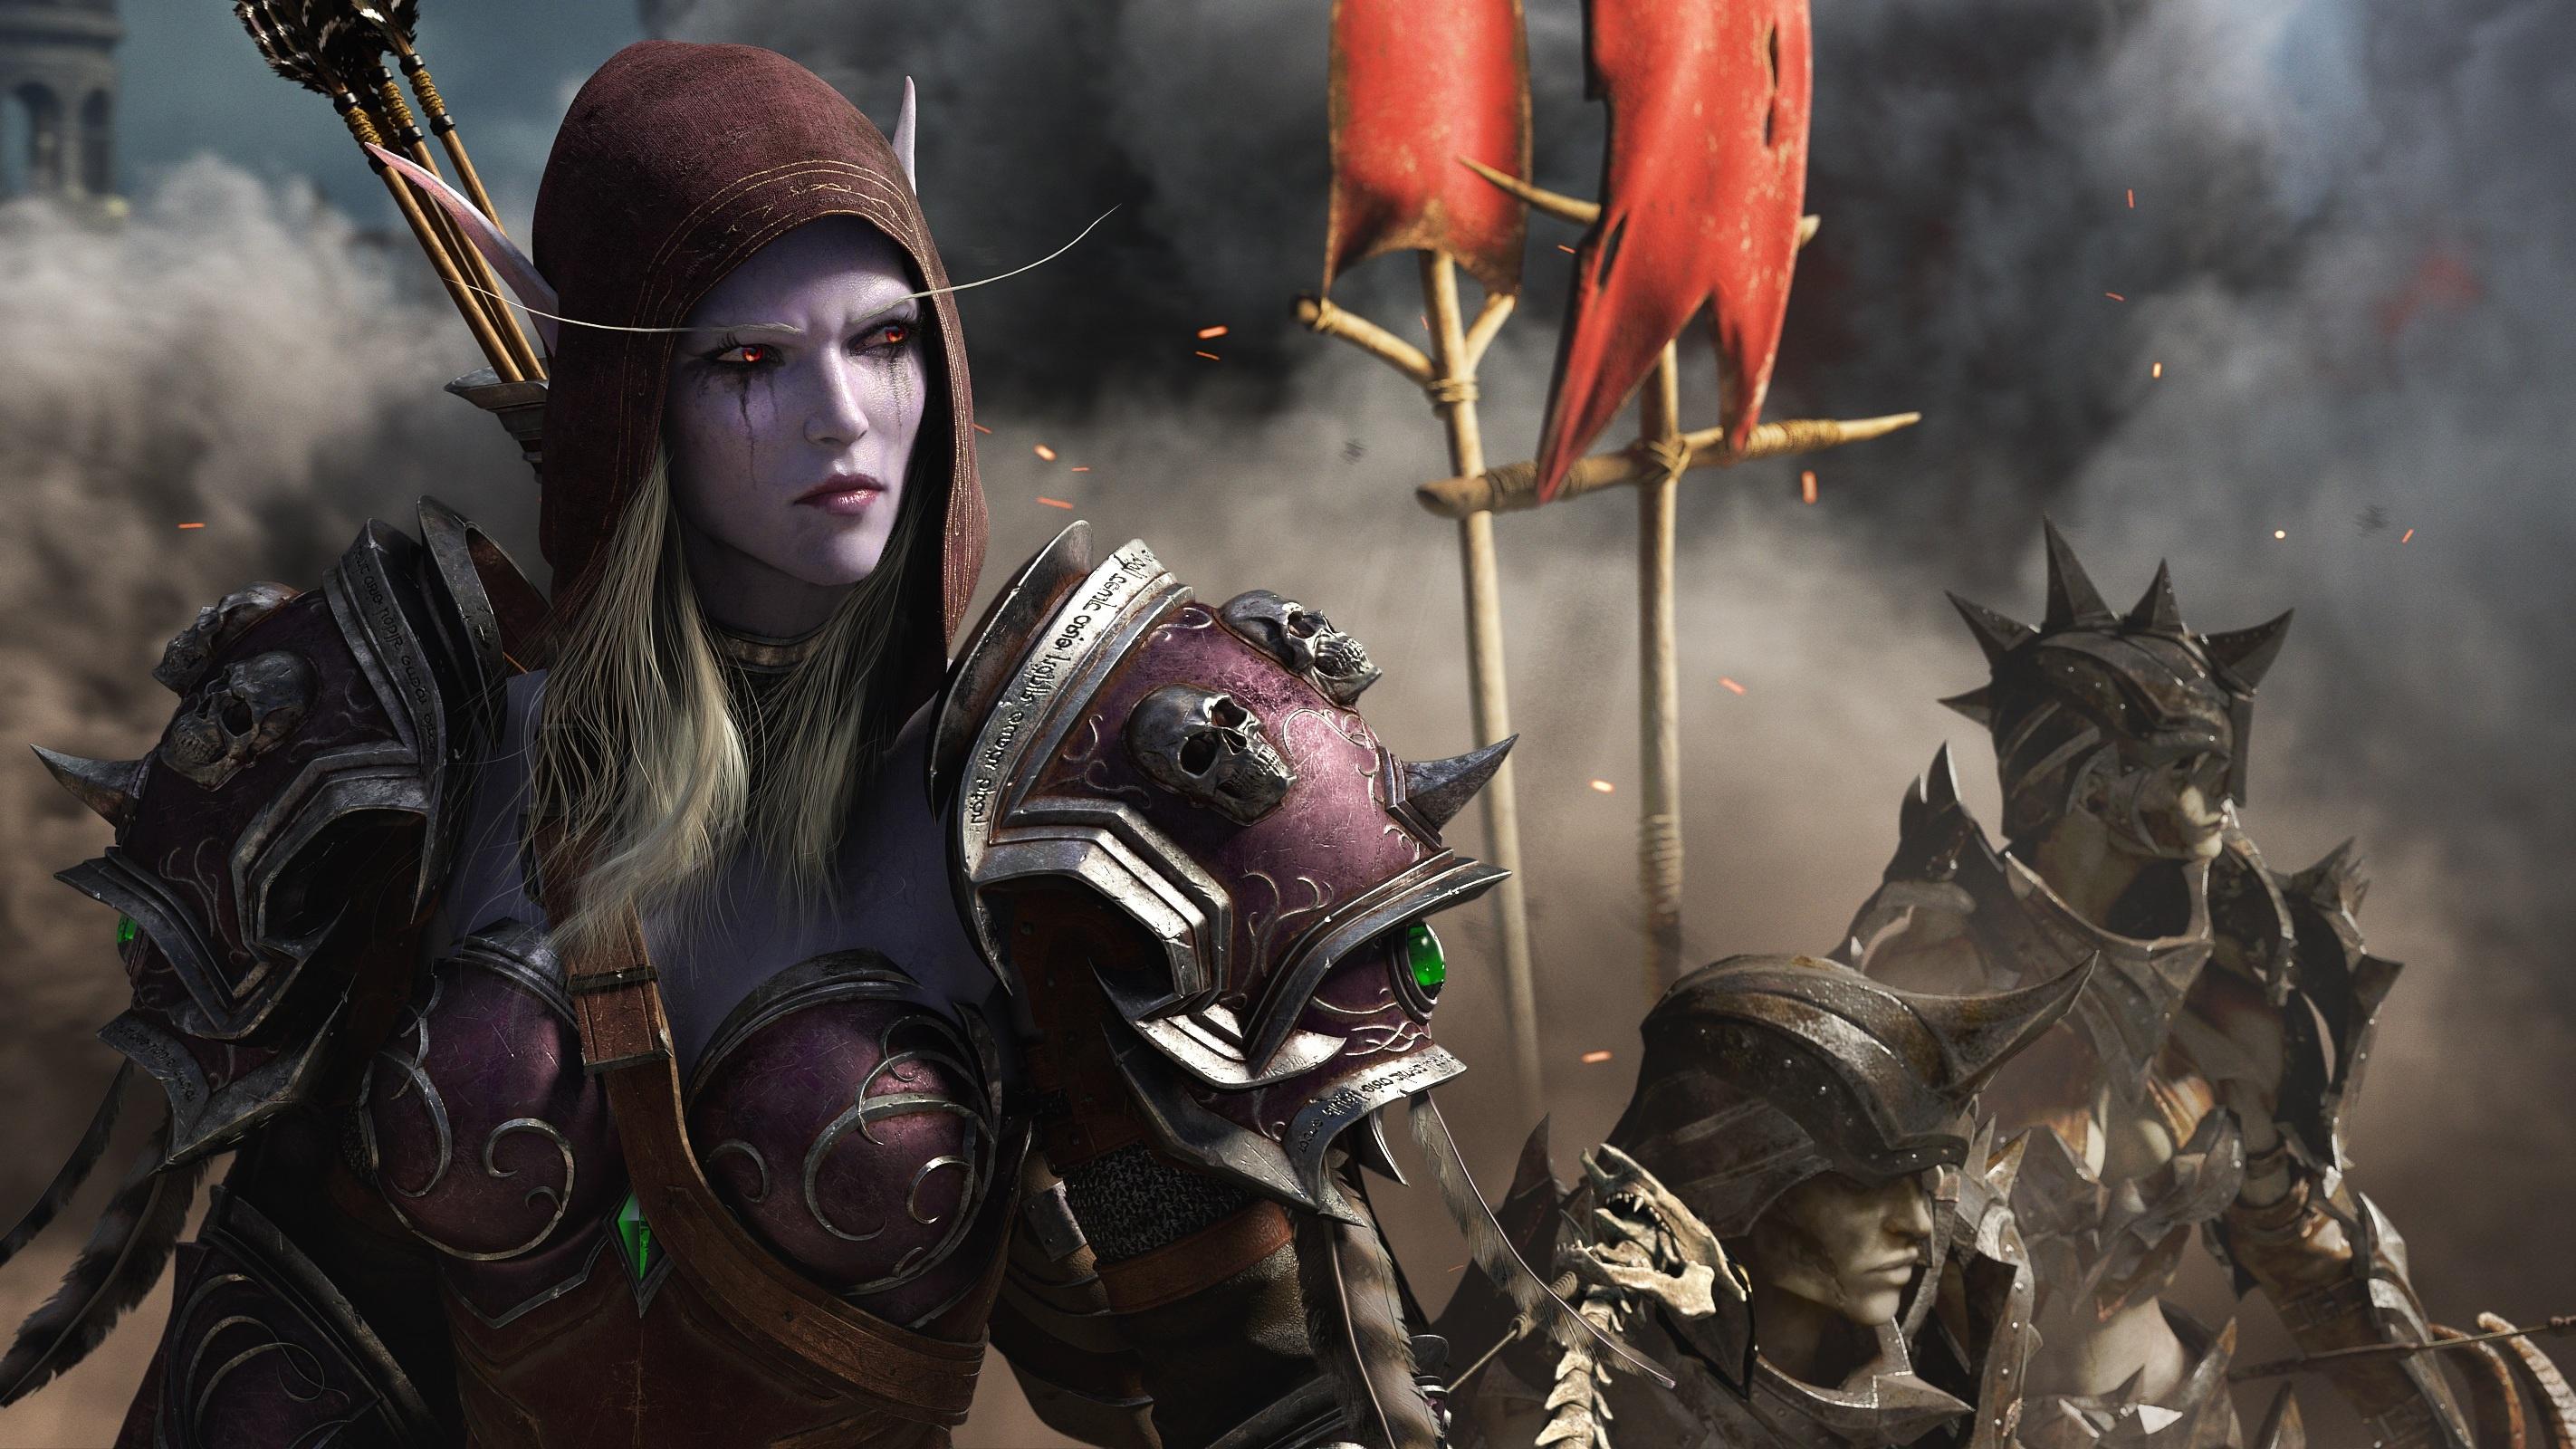 Bfa Hd Wallpaper: World Of Warcraft: Battle For Azeroth HD Wallpaper